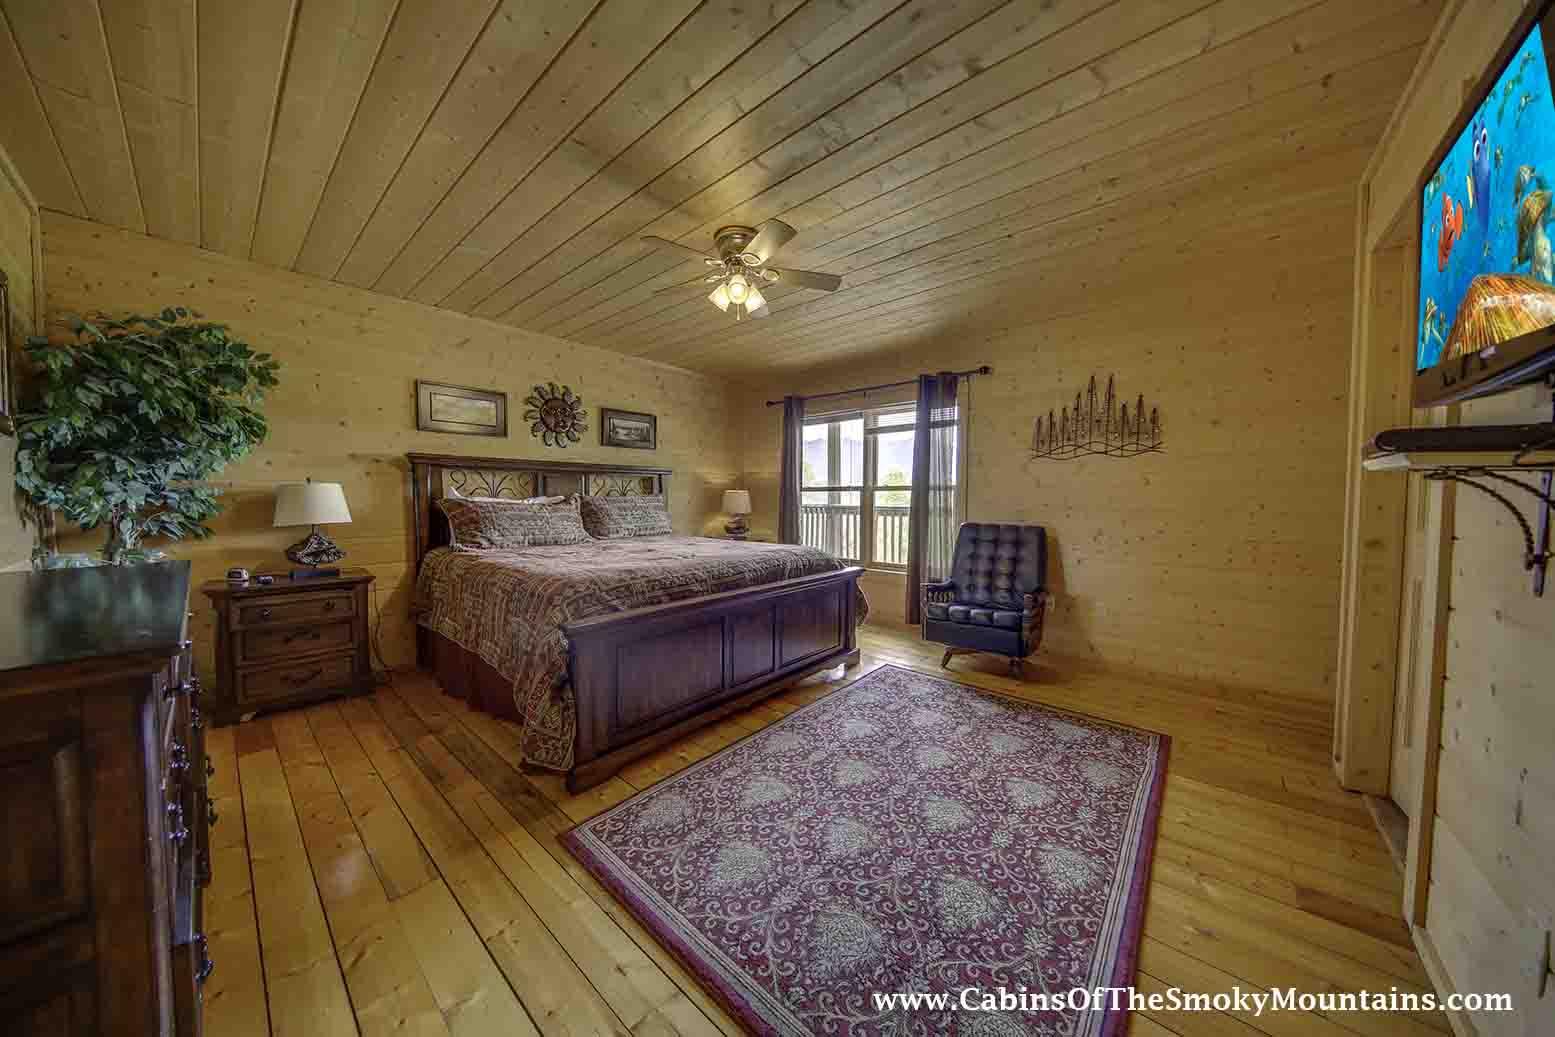 7 Bedroom Cabins In Gatlinburg 28 Images Pigeon Forge Cabin Big Bear Retreat 7 Bedroom